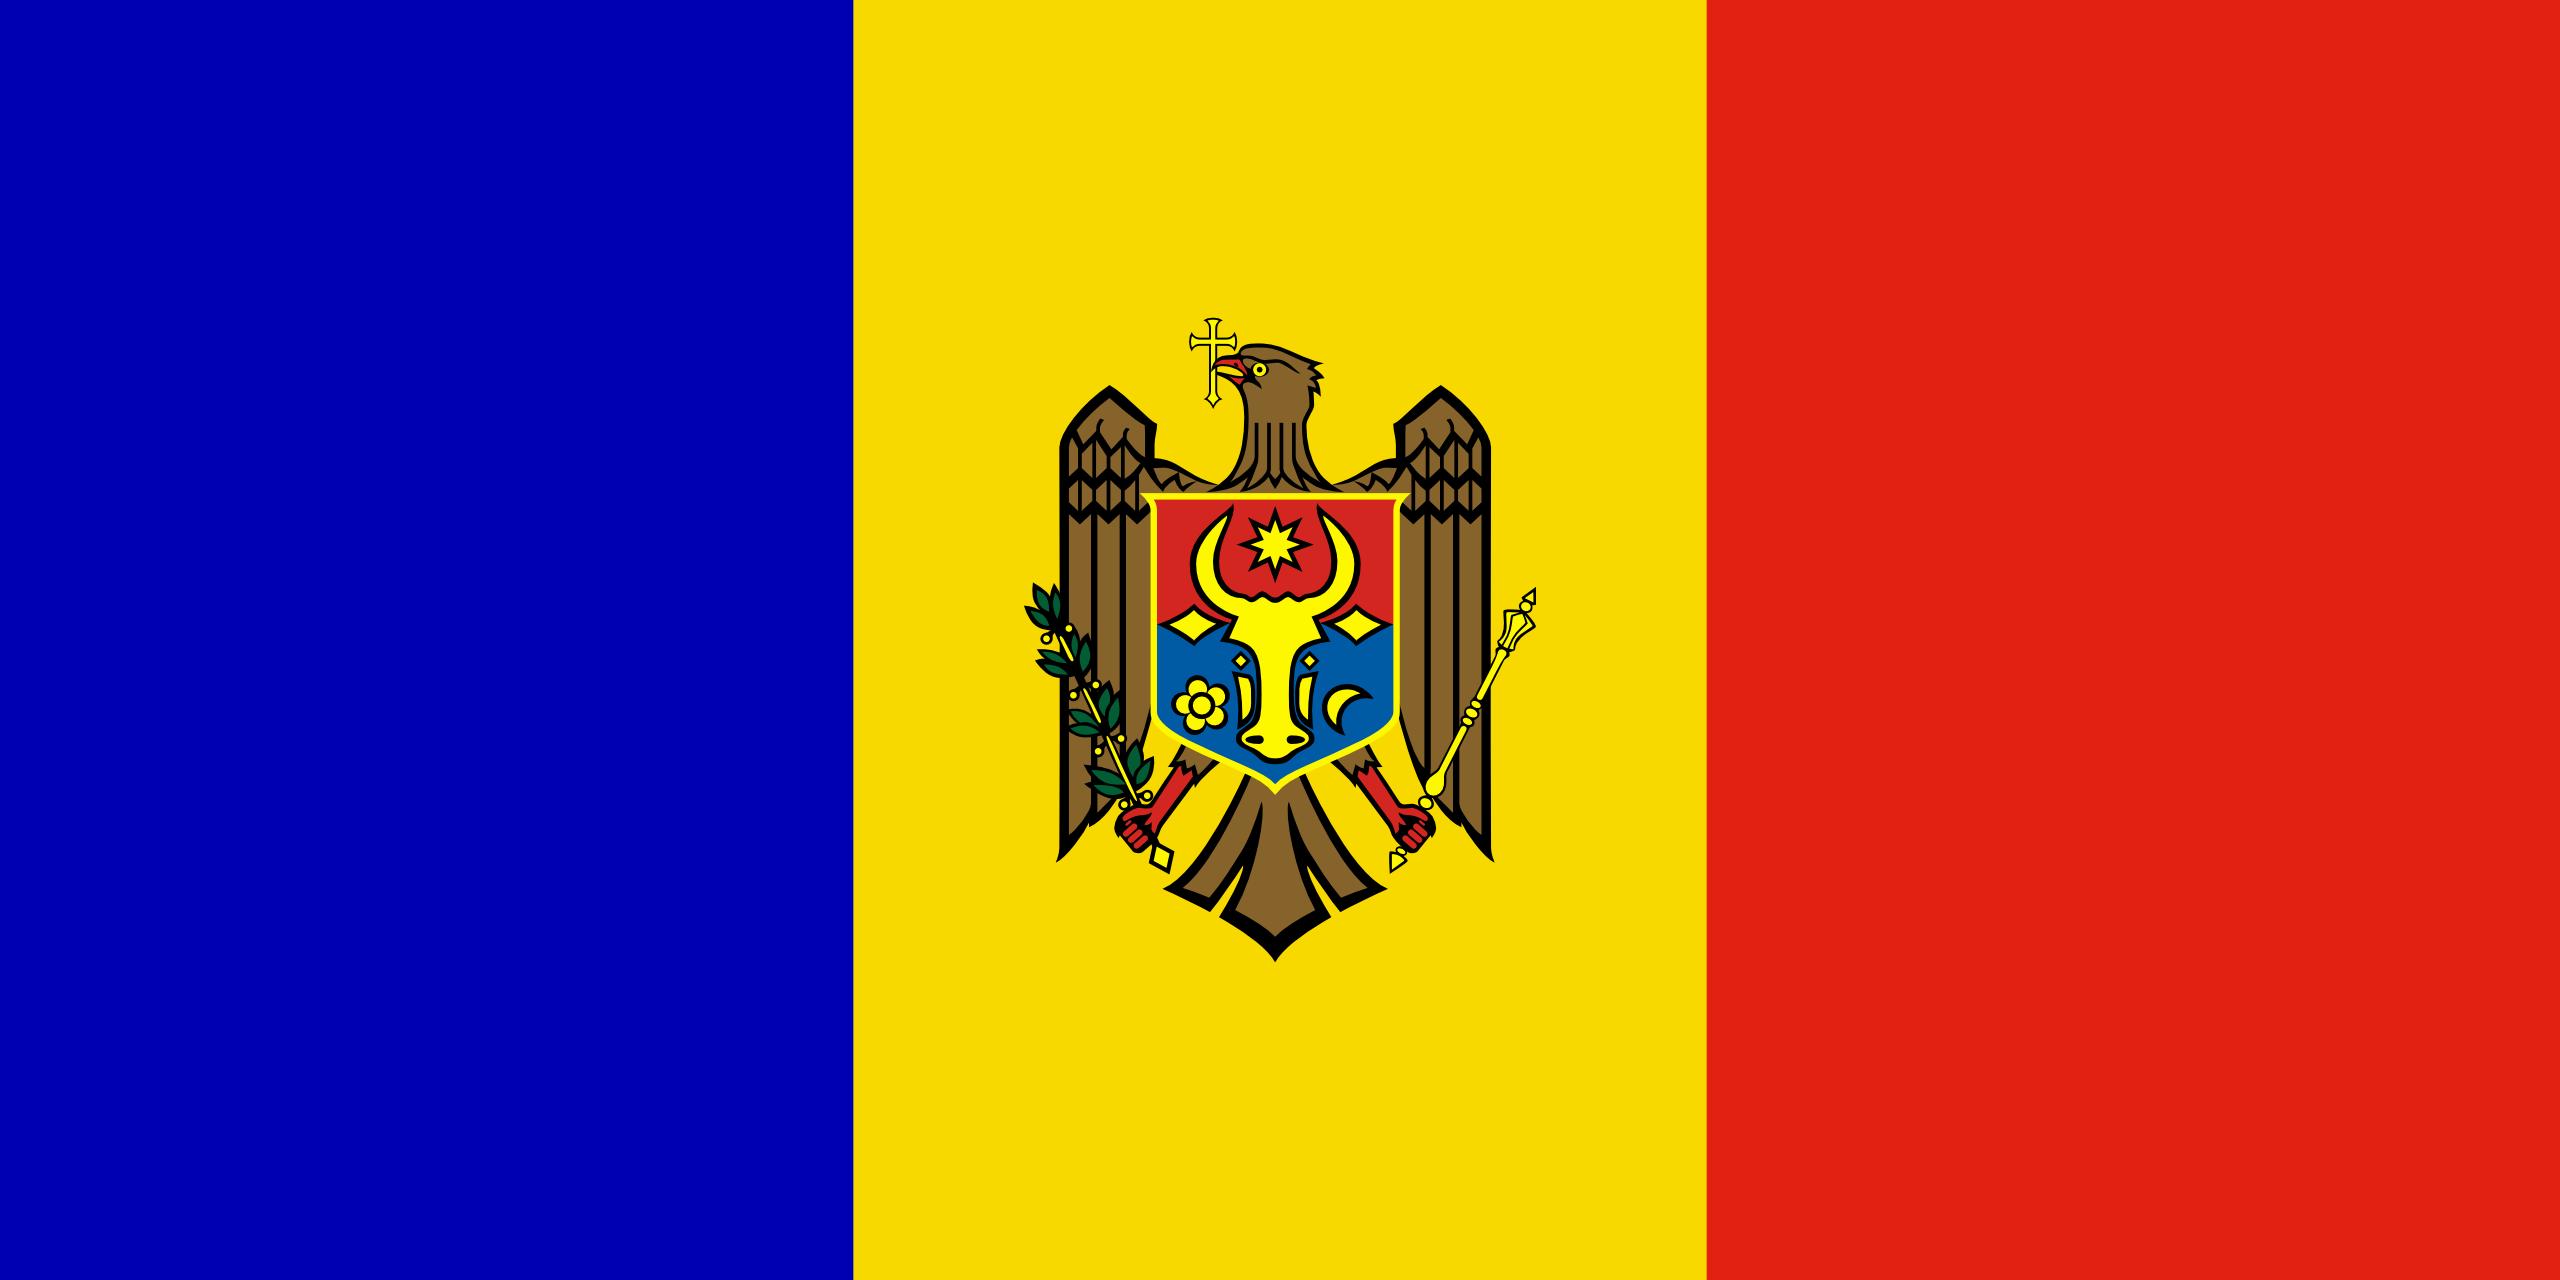 moldavia, paese, emblema, logo, simbolo - Sfondi HD - Professor-falken.com